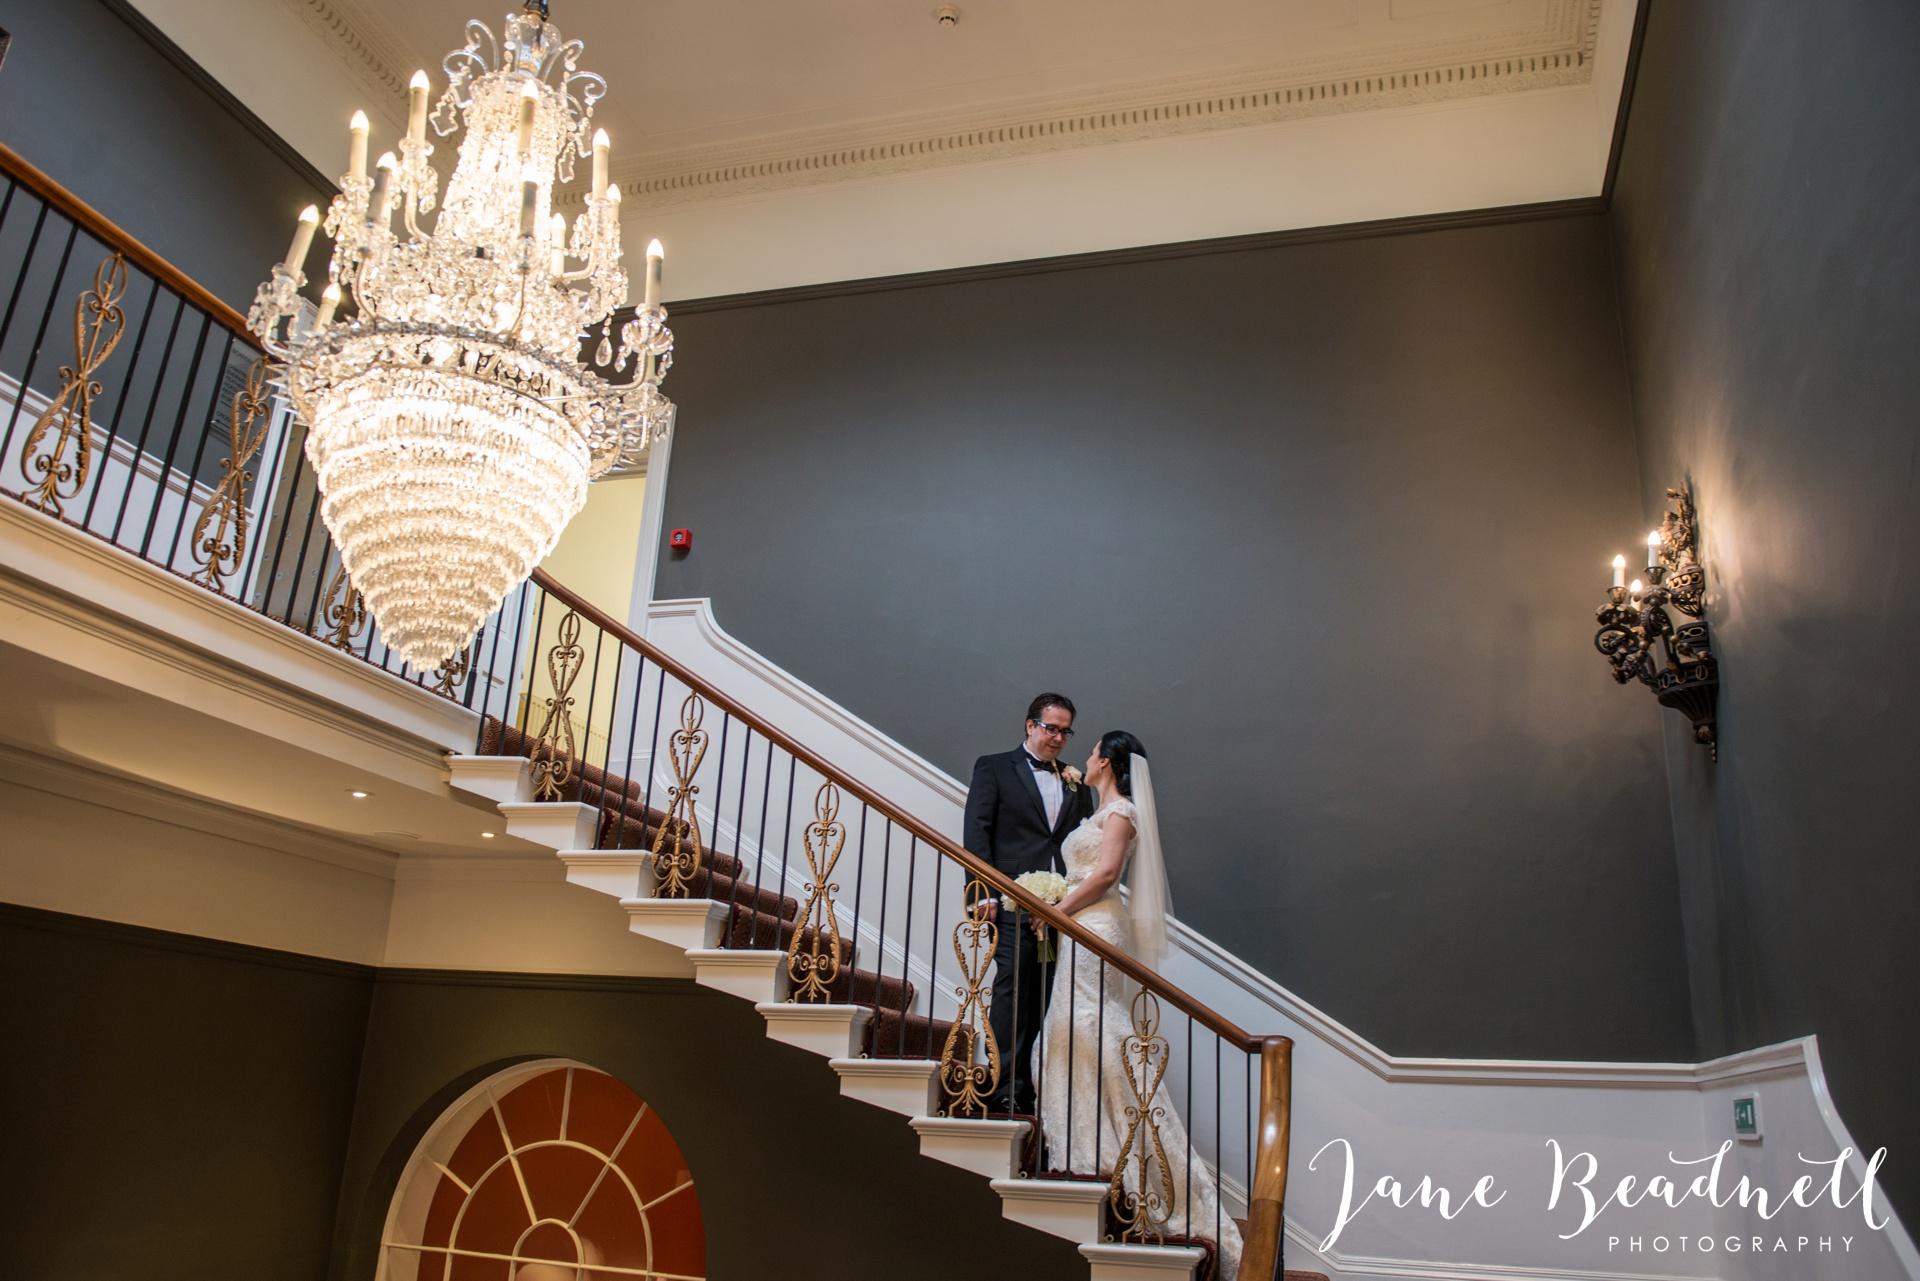 Jane Beadnell fine art wedding photographer Rudding Park Harrogate_0035